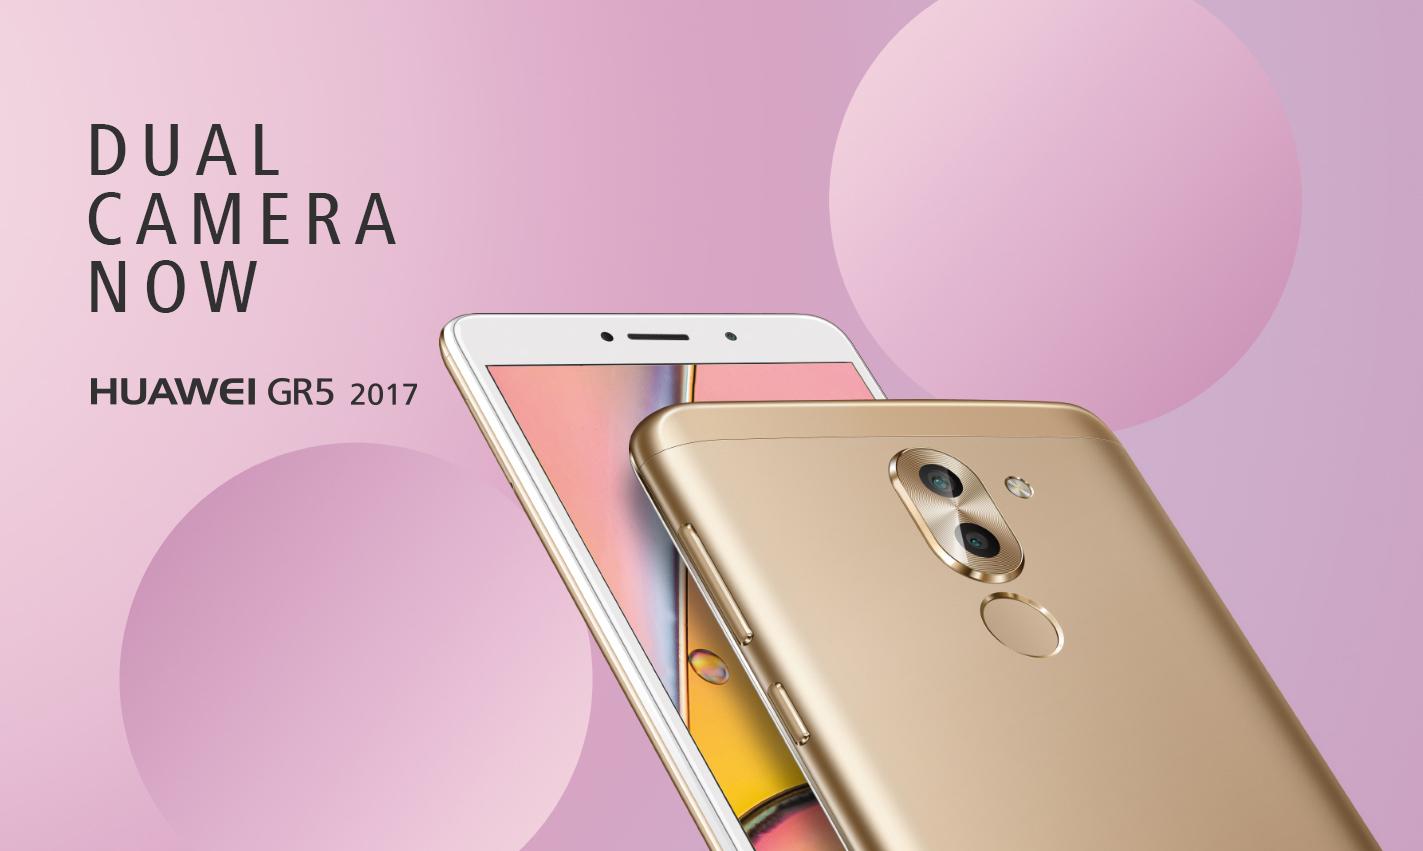 Huawei-GR5-2017-SpecPhone-00001